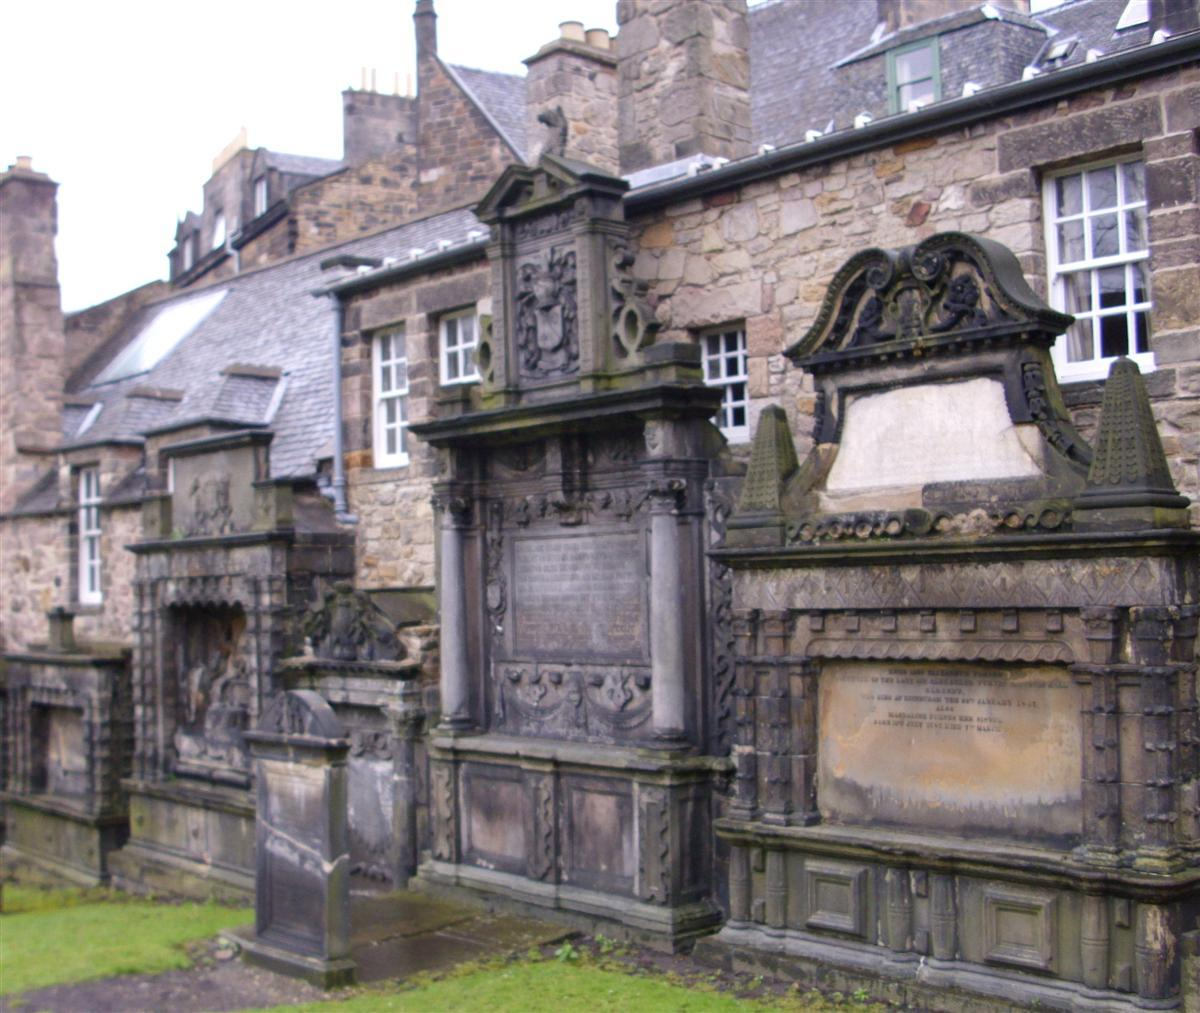 El cementerio de greyfiars edimburgo paperblog for Mas edimburgo